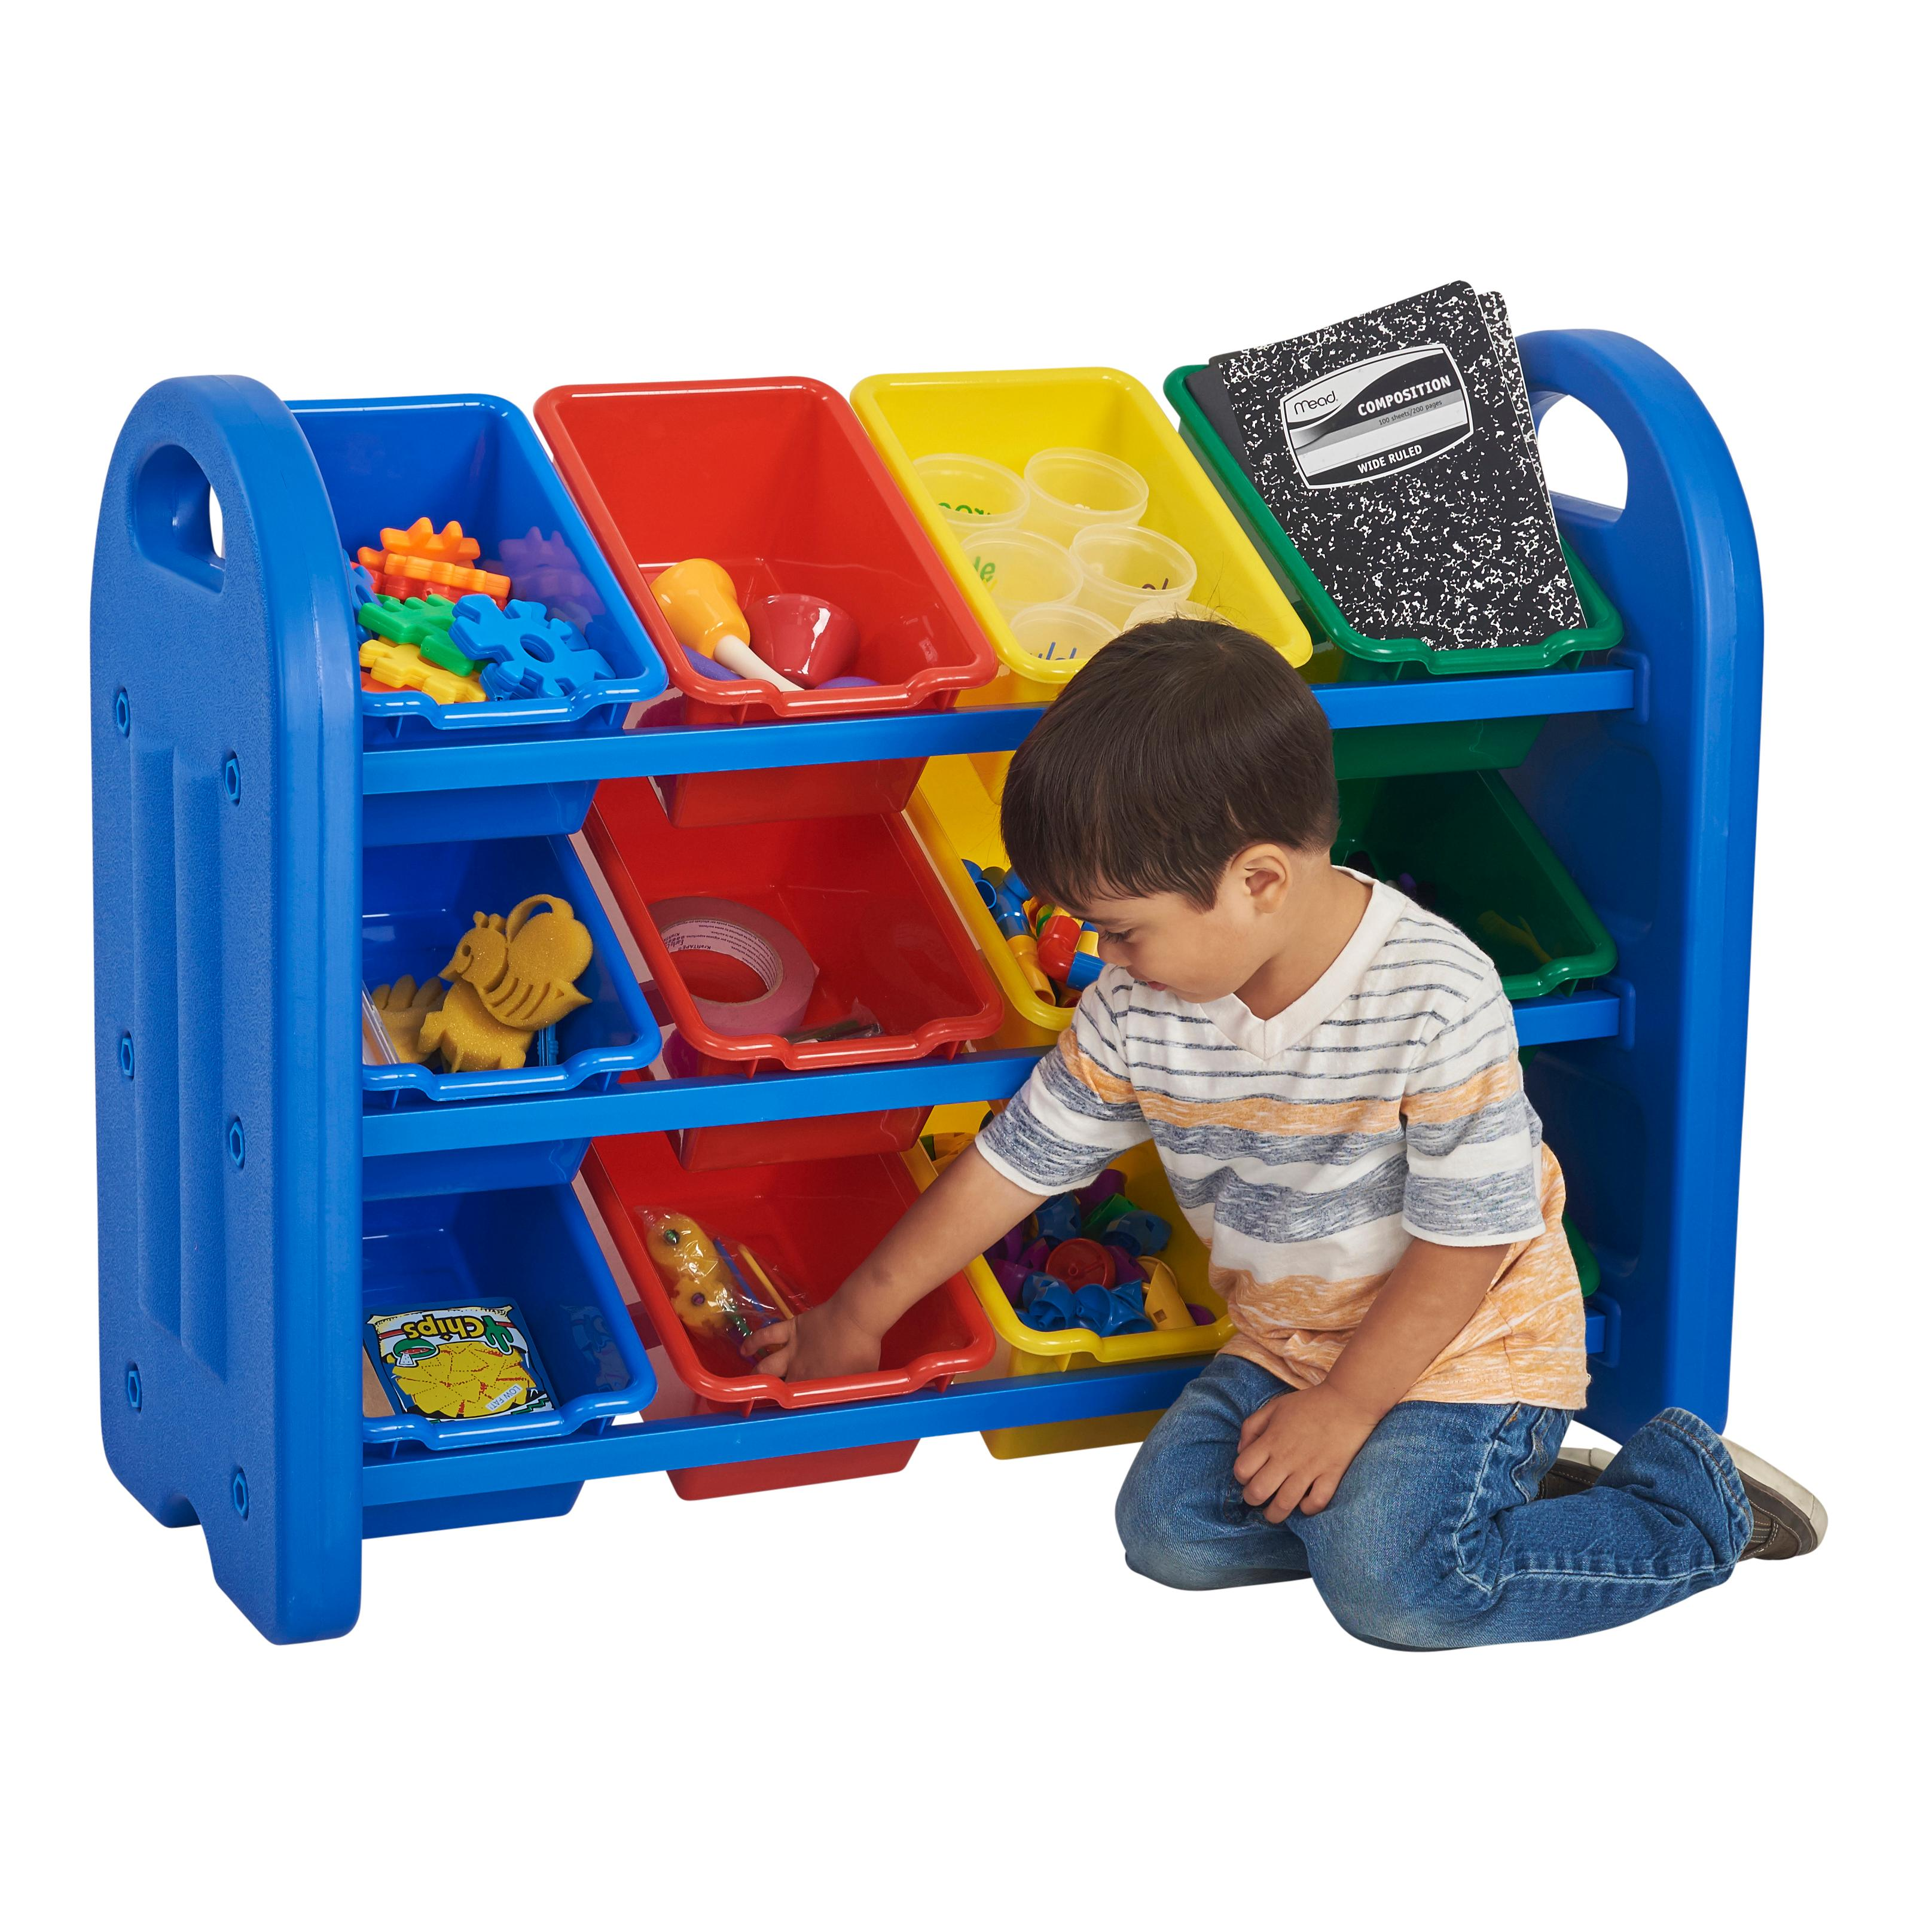 ecr4kids 3 tier toy storage organizer with 12 bins ecr4kids tools home improvement. Black Bedroom Furniture Sets. Home Design Ideas